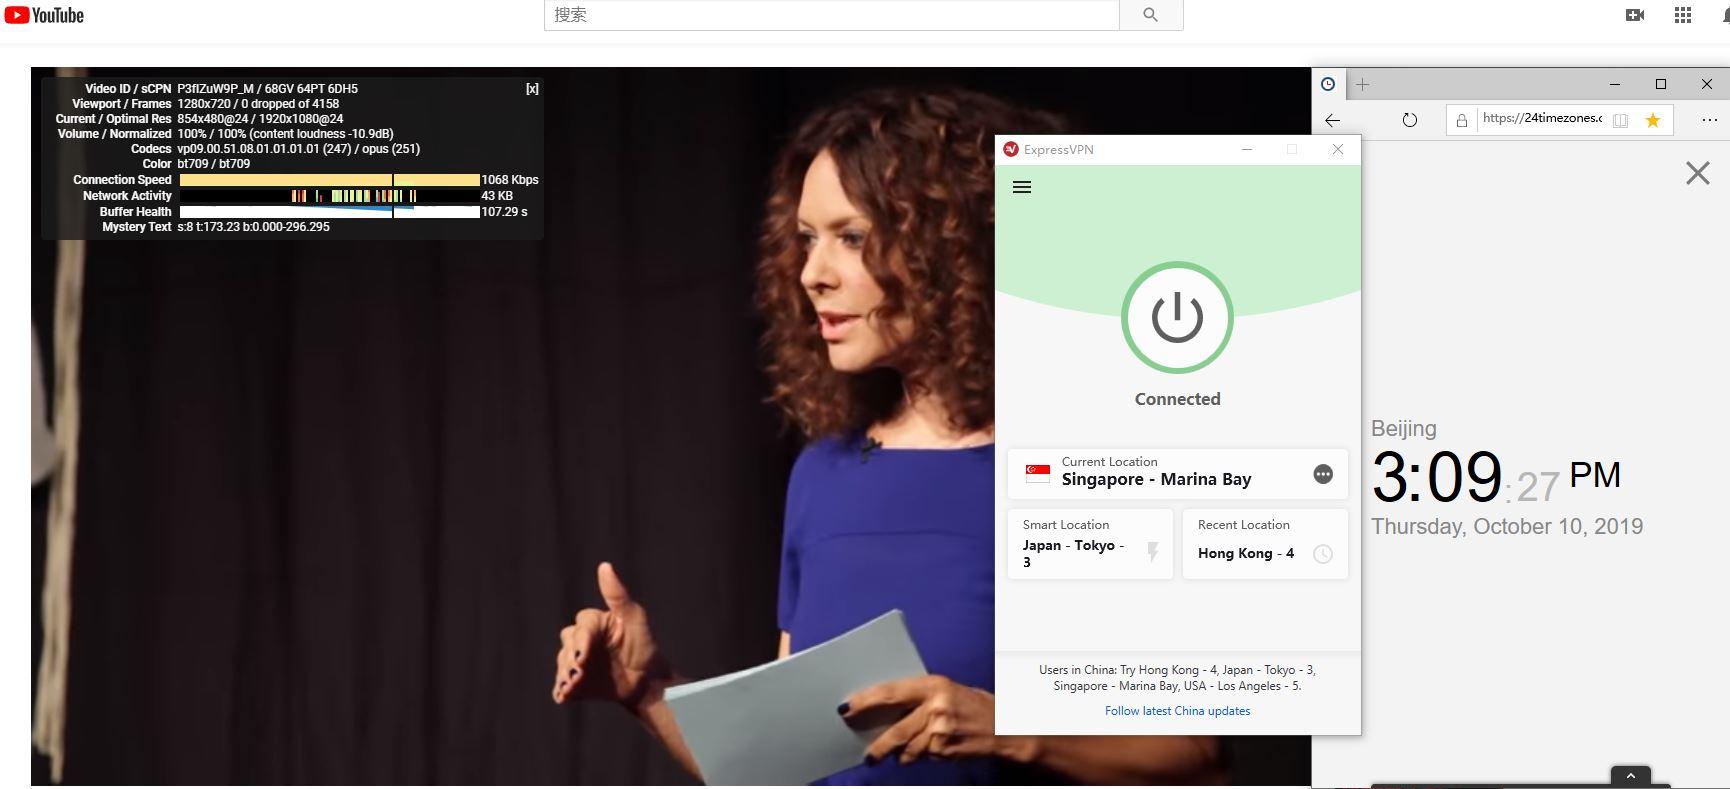 Windows ExpressVPN Singapore - Marina Bay 中国VPN翻墙 科学上网 Youtube测速-20191010